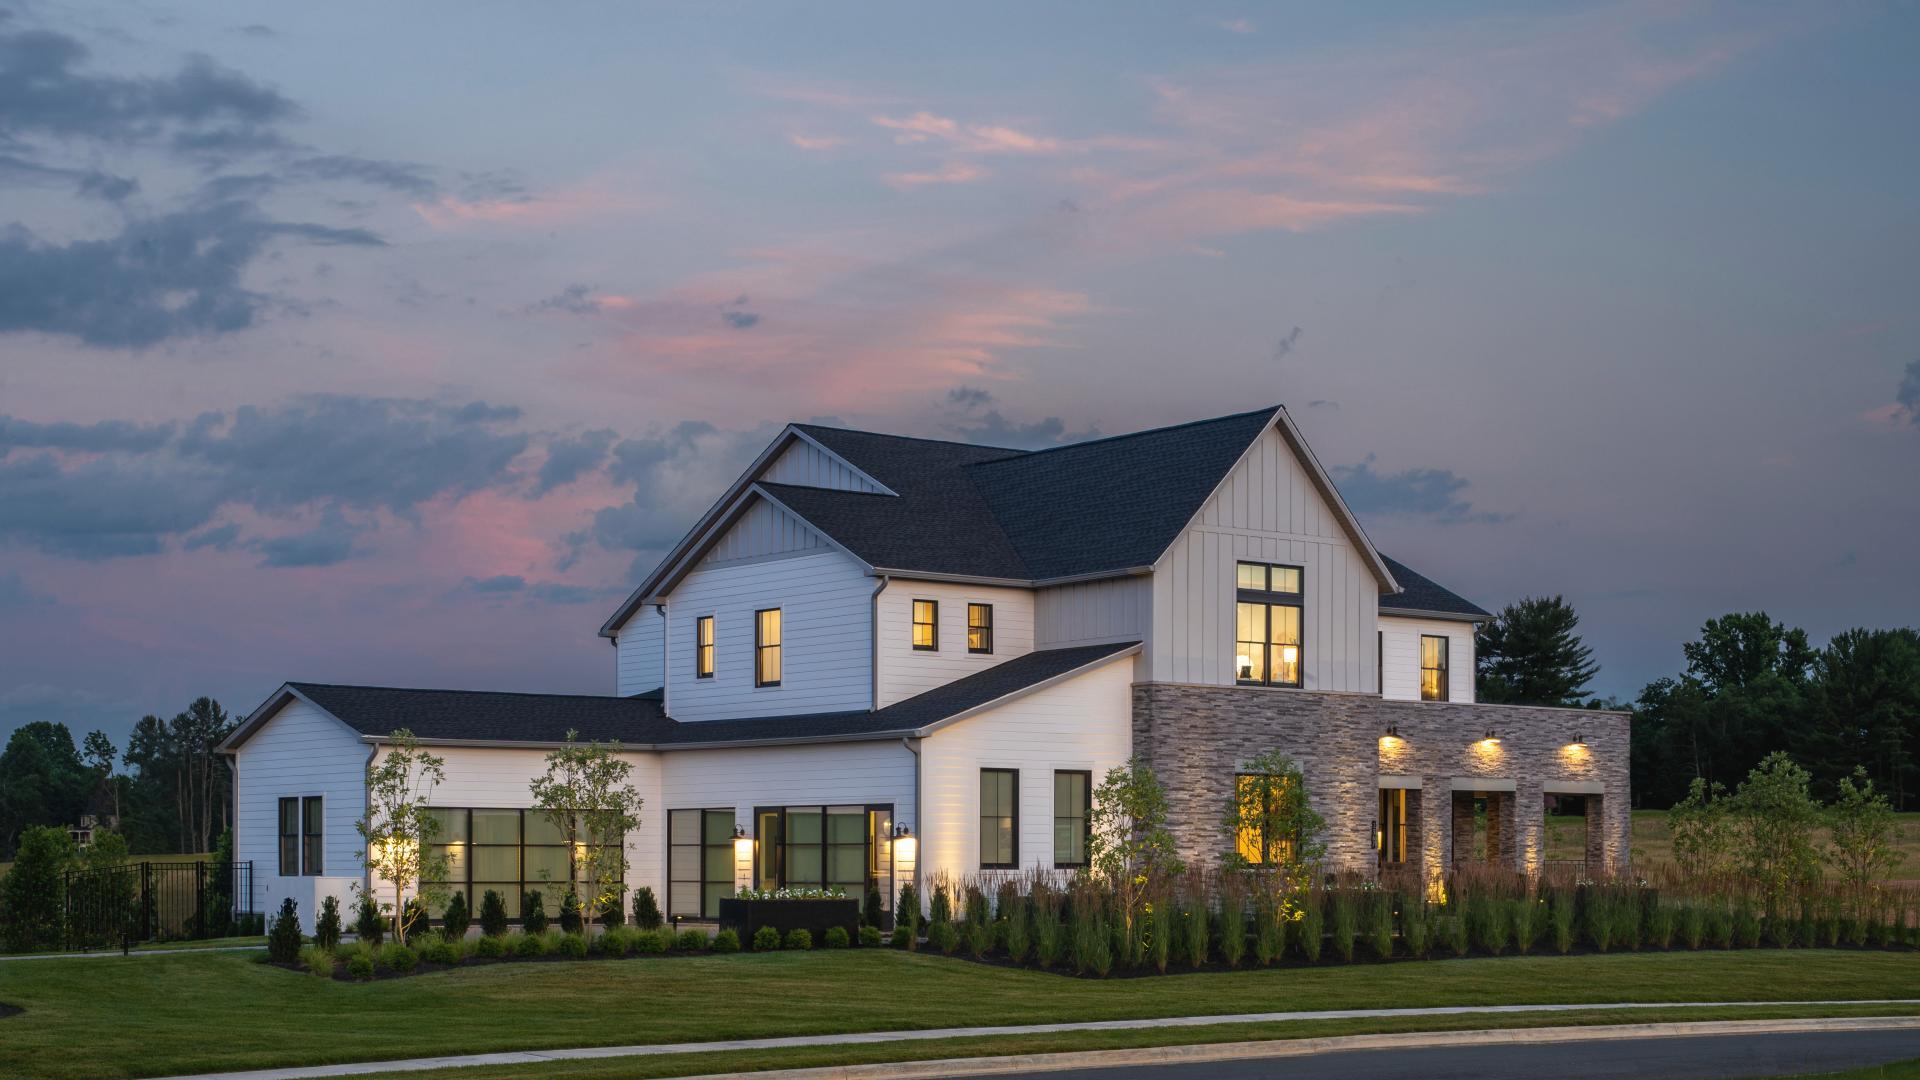 Modern exterior styles